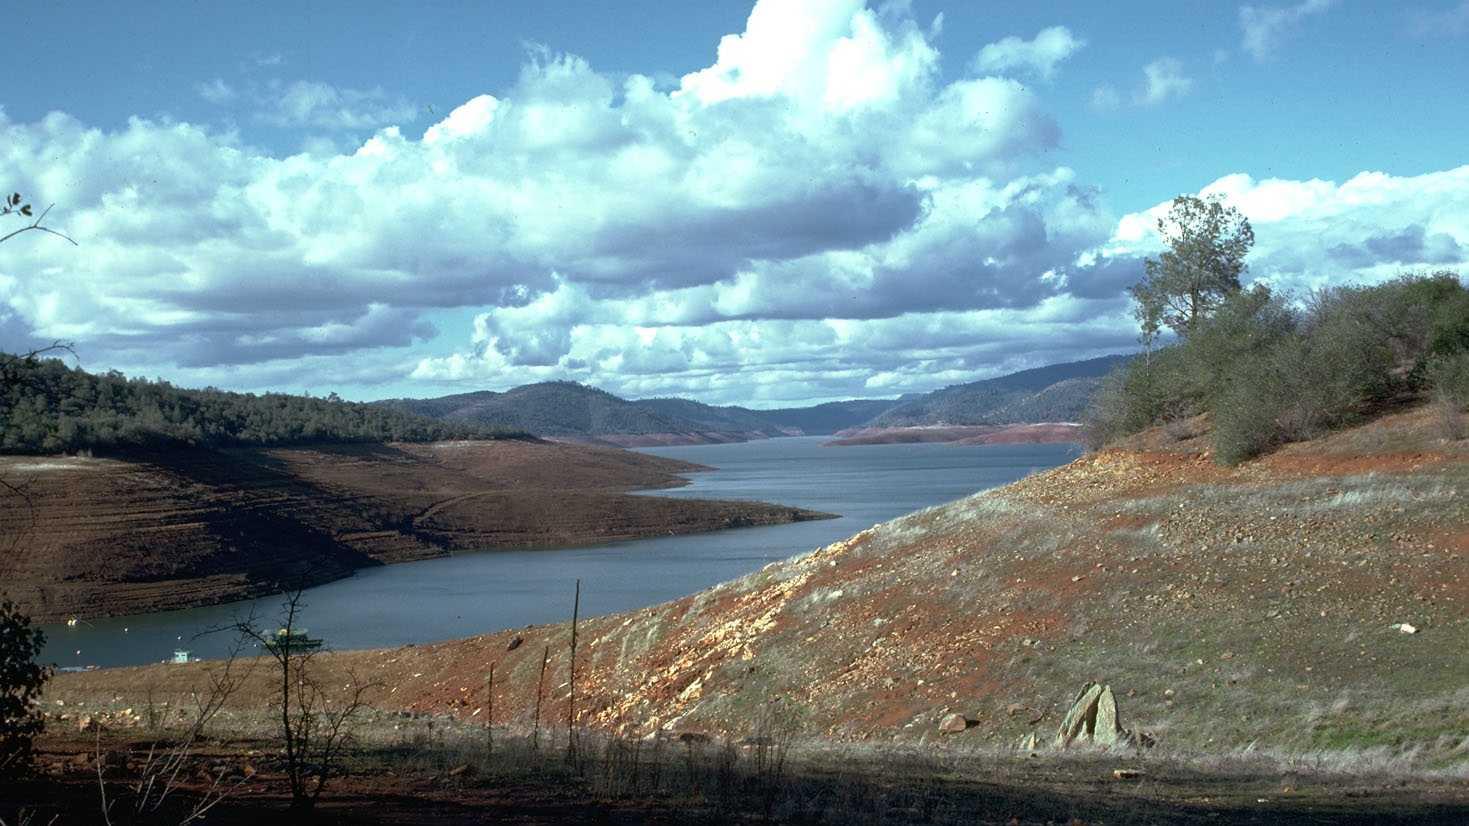 1976-77 drought Lake Shasta